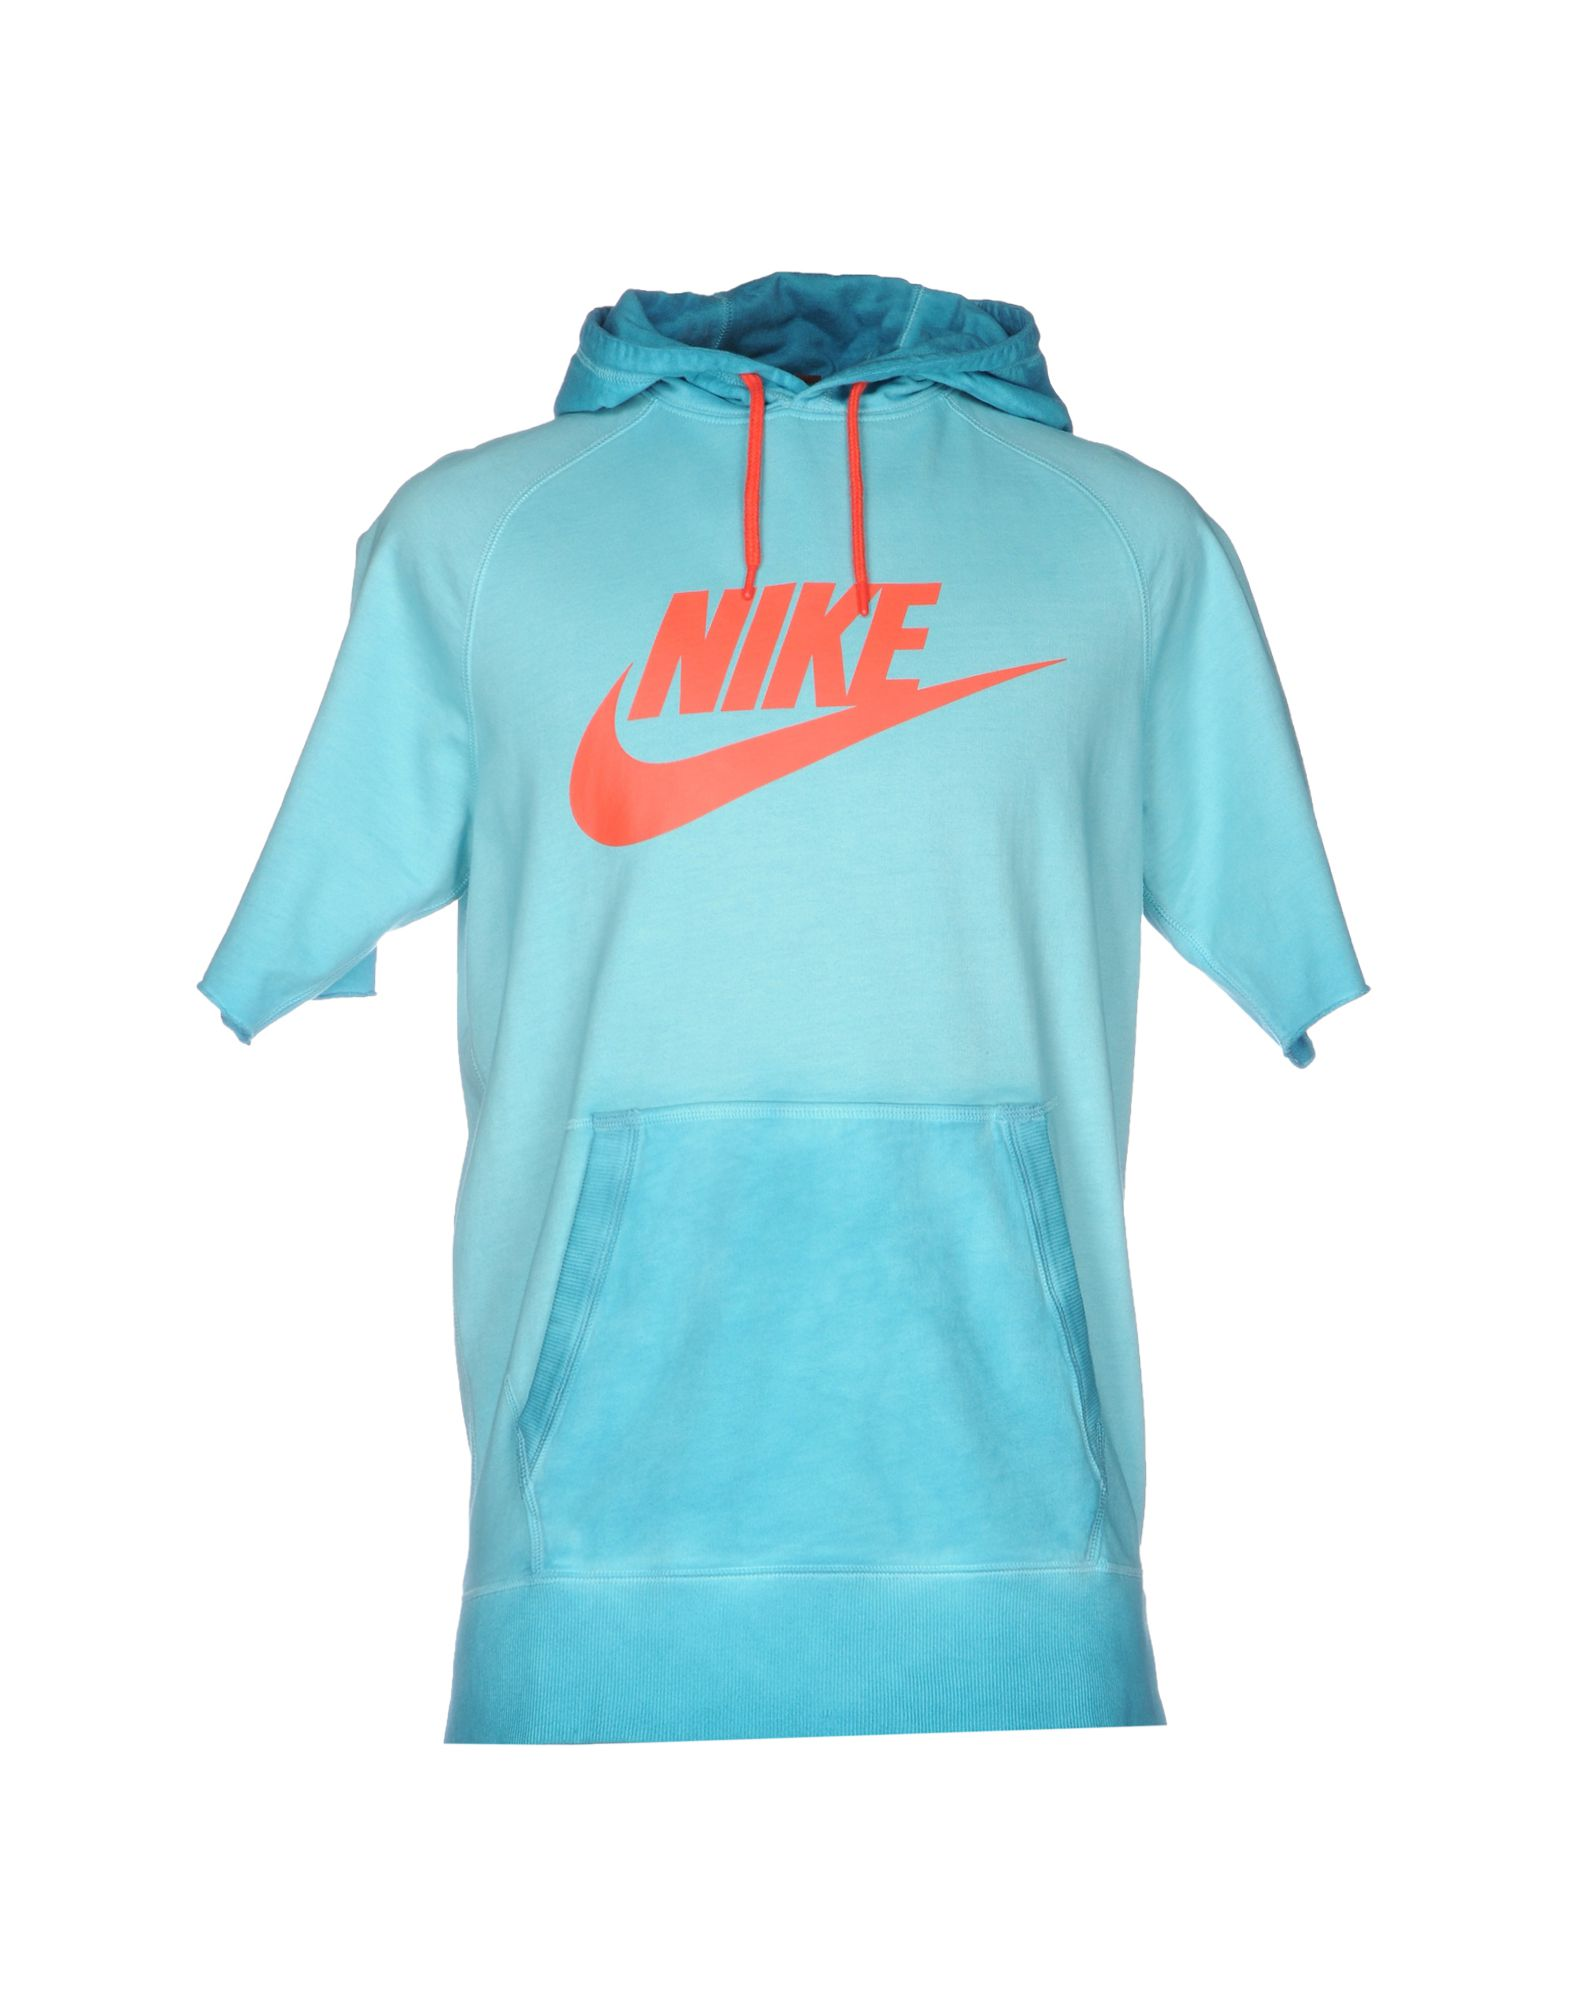 Nike Impossibly Light Cropped Jacket Shop At Ebates